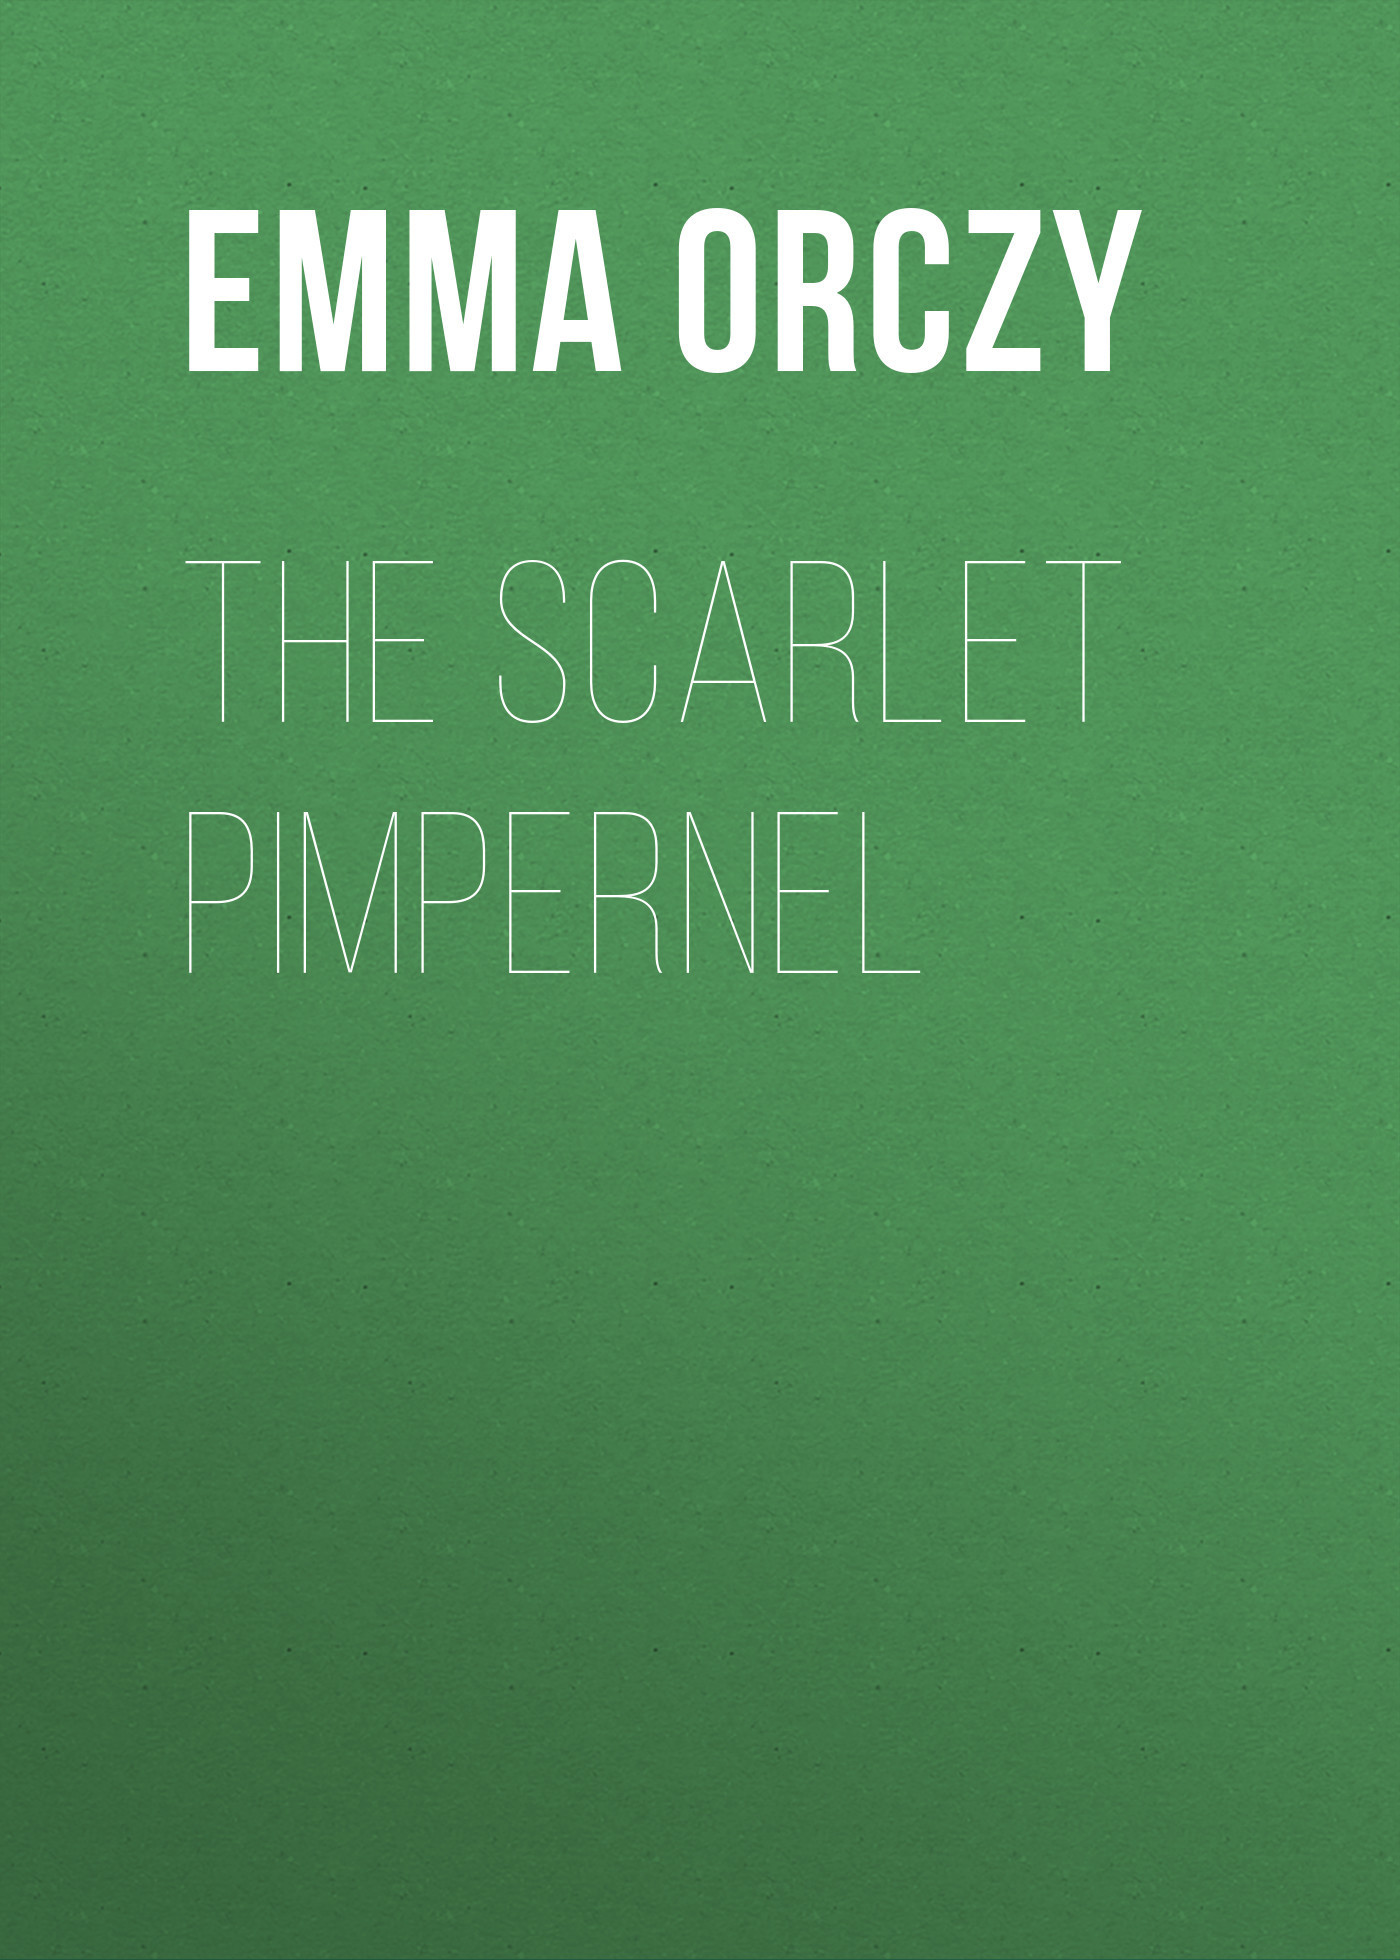 Emma Orczy The Scarlet Pimpernel красное боди emma xxl 3xl